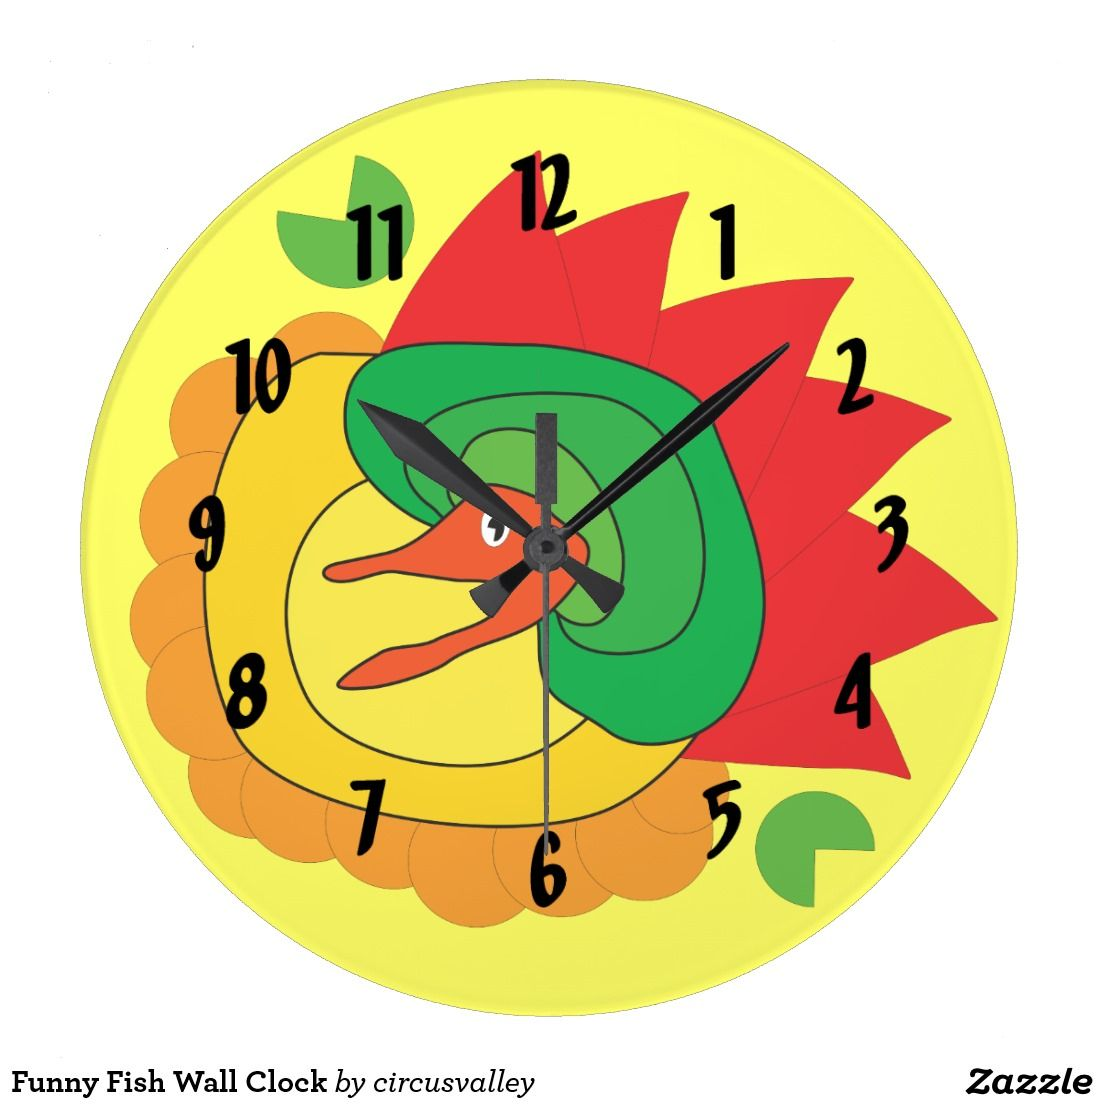 Funny fish wall clock weird wall clocks on zazzle pinterest funny fish wall clock amipublicfo Images